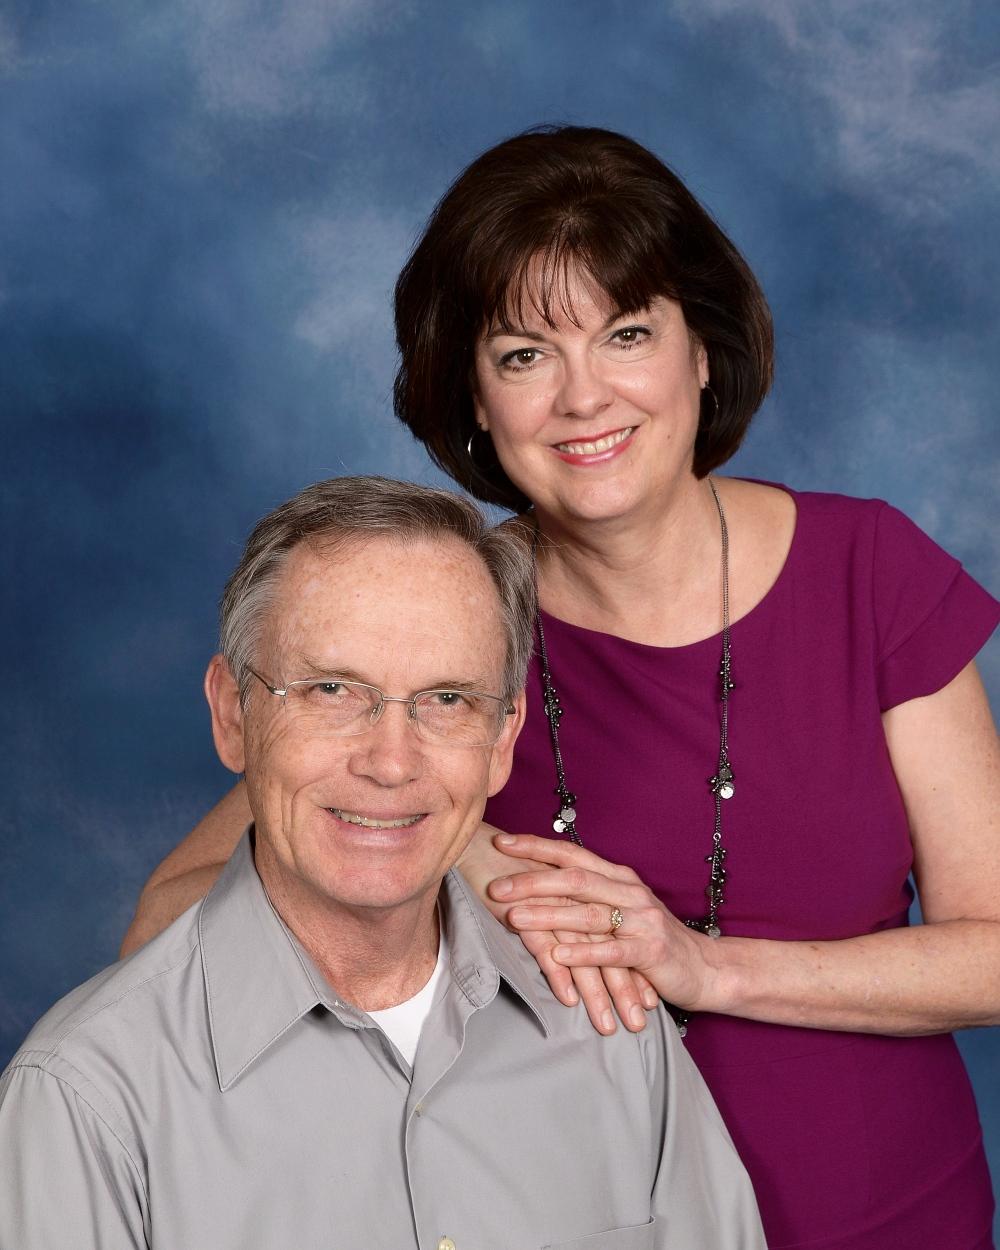 Larry & Mandy Renfro : Malawi, Africa